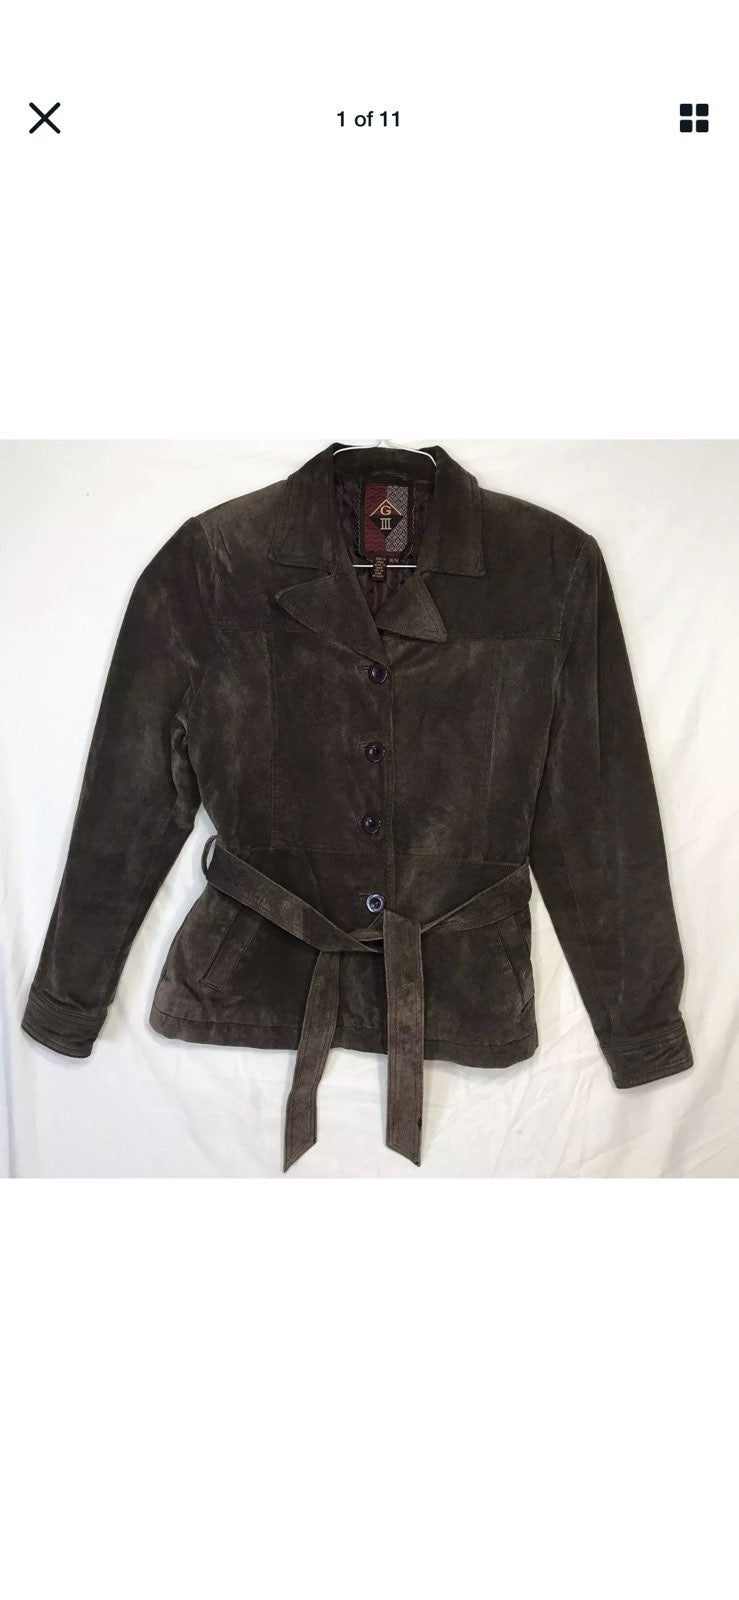 GIII Suede Leather Womens Medium Jacket